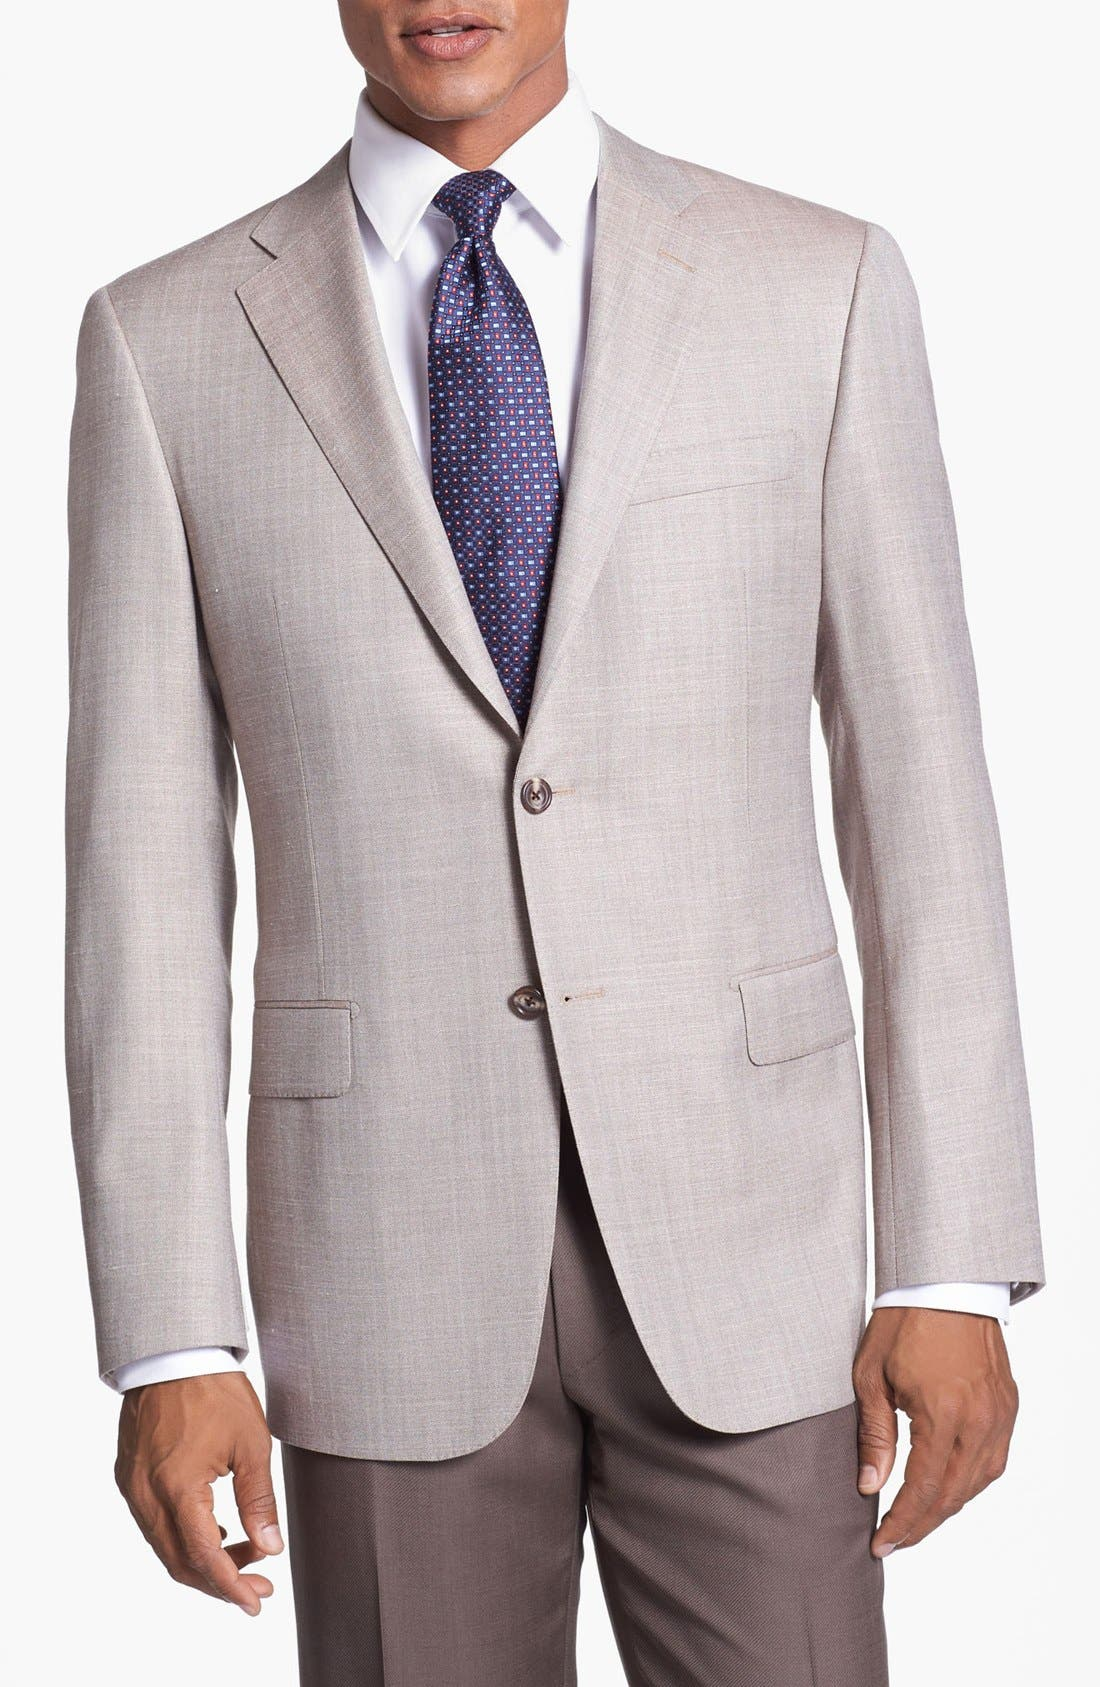 Alternate Image 1 Selected - Hickey Freeman Wool Blend Sportcoat